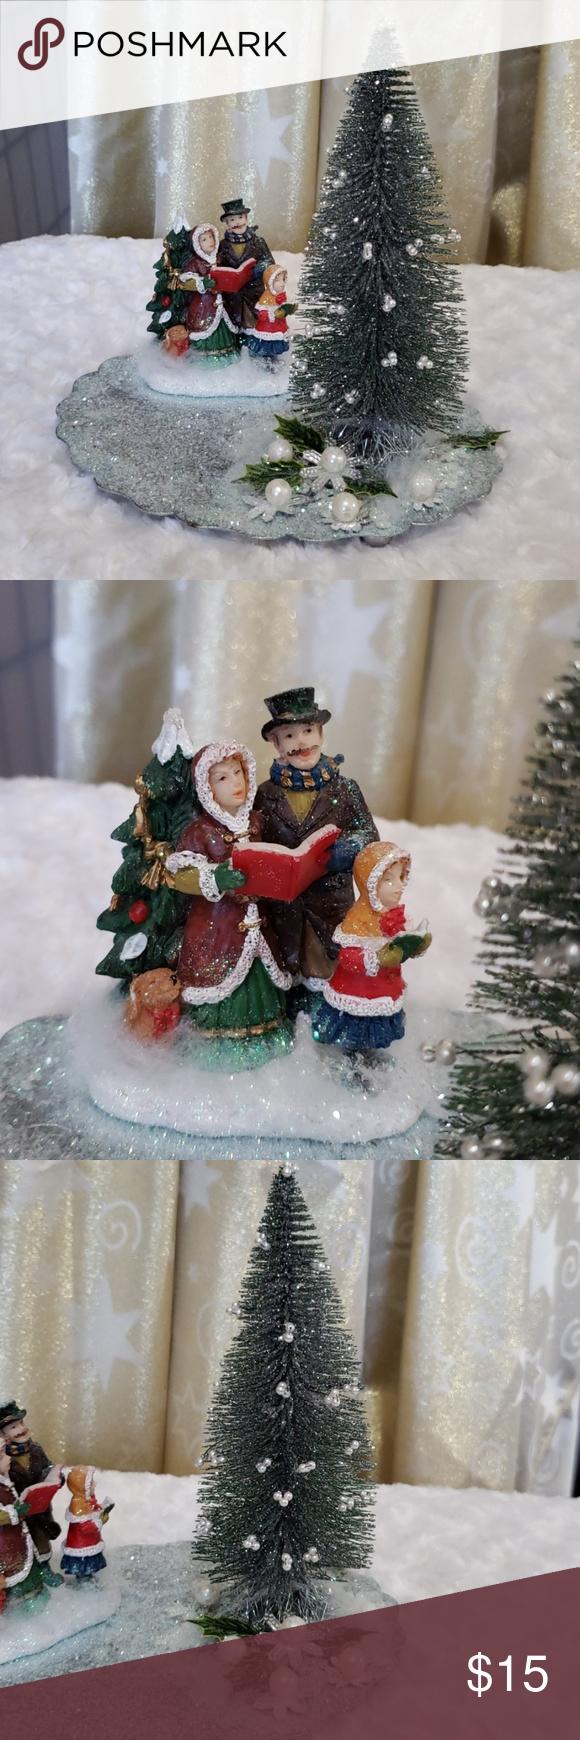 Christmas Decoration Christmas Decorations Holiday Decor Colorful Decor